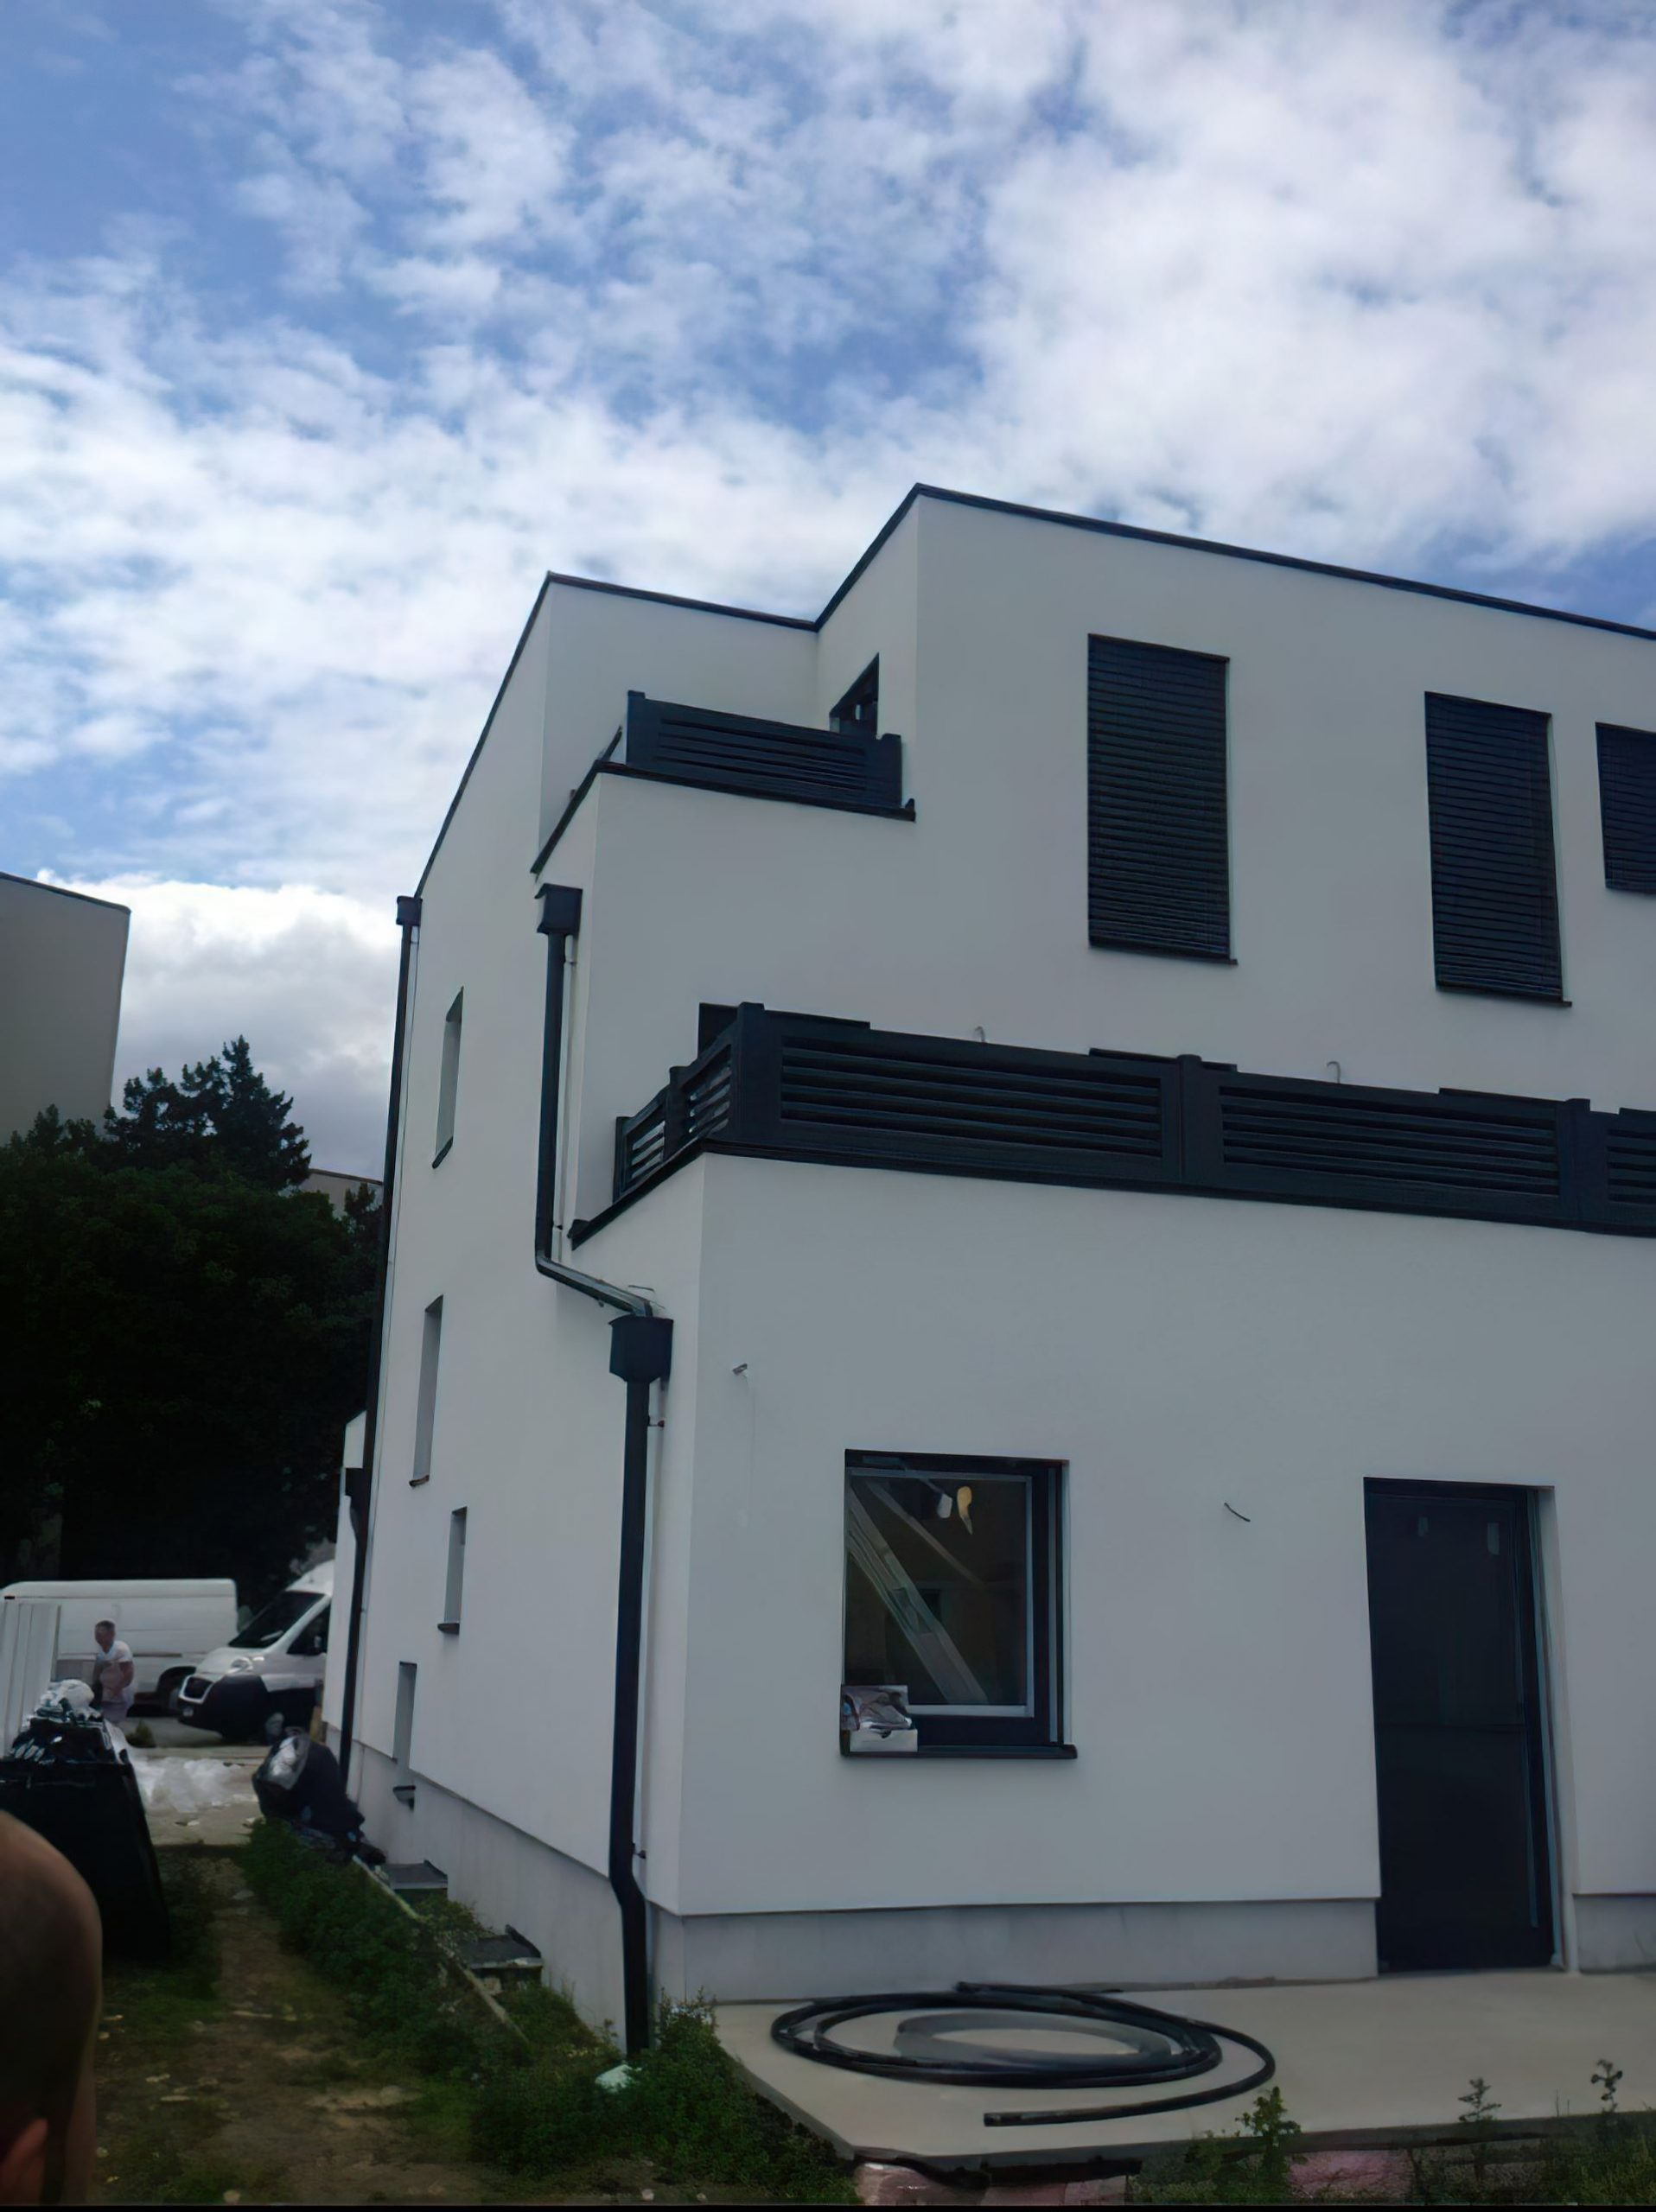 https://bausan.at/wp-content/uploads/2020/11/bausan-referenzen-grossenzersdorf-0005-scaled.jpg